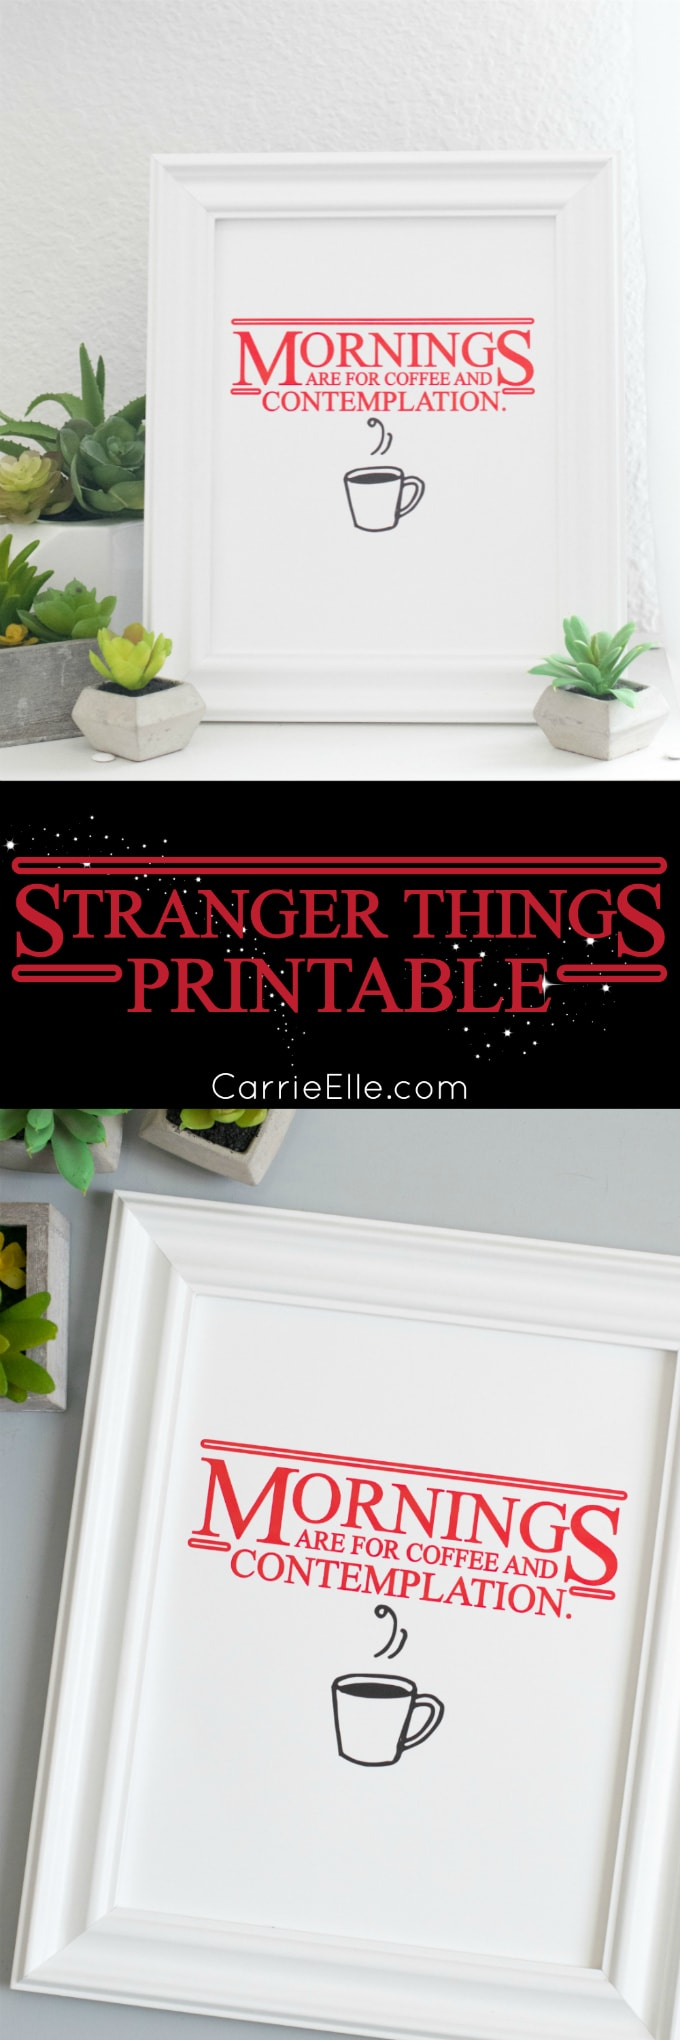 Stranger Things Printable